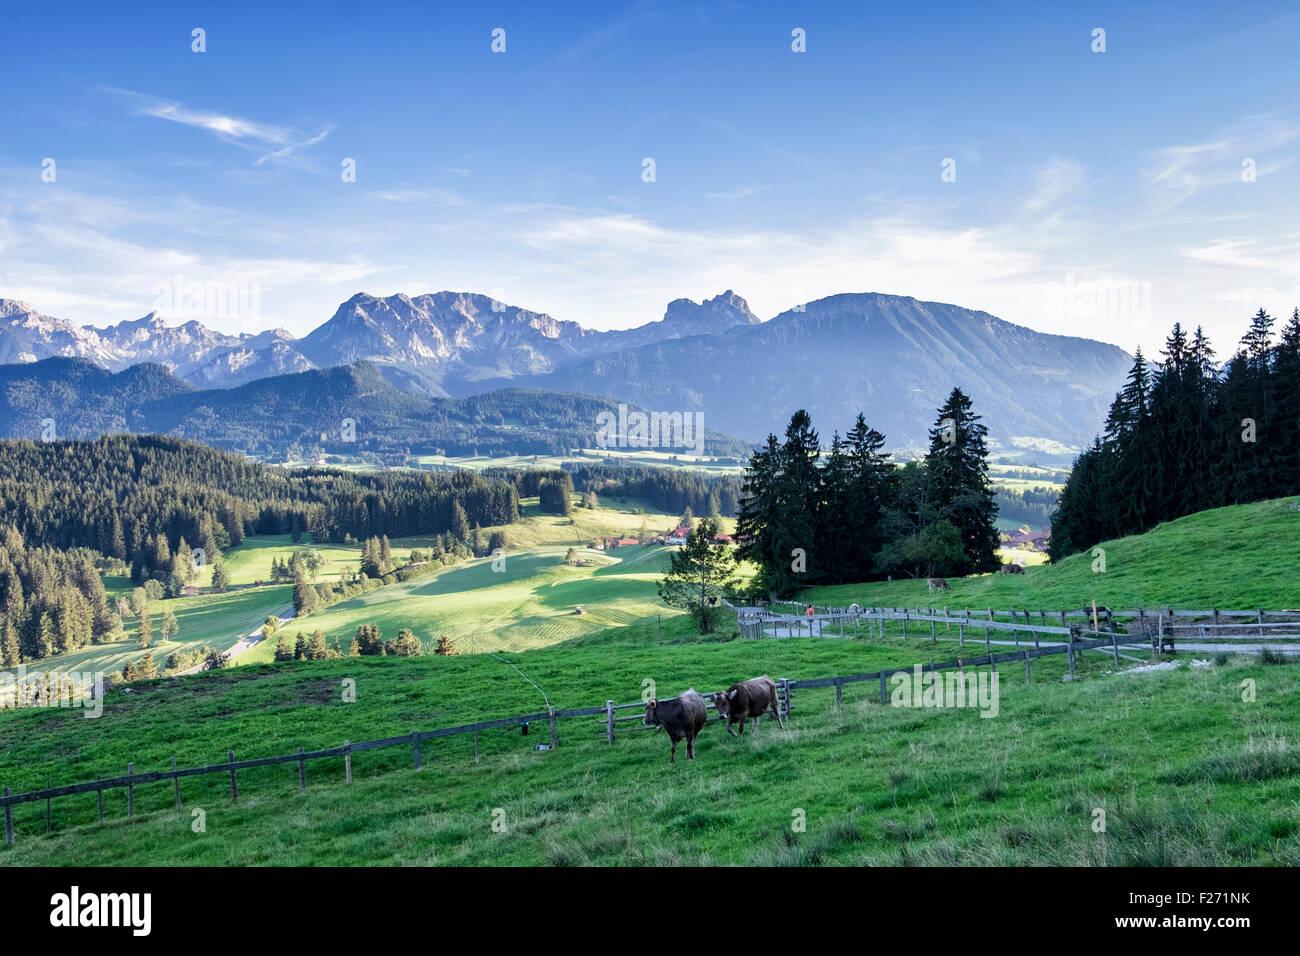 Bavarian Alps with cows grazing in lush farm meadow, Eisenberg, Eastern Allgaü, Bavaria, Germany - Stock Image